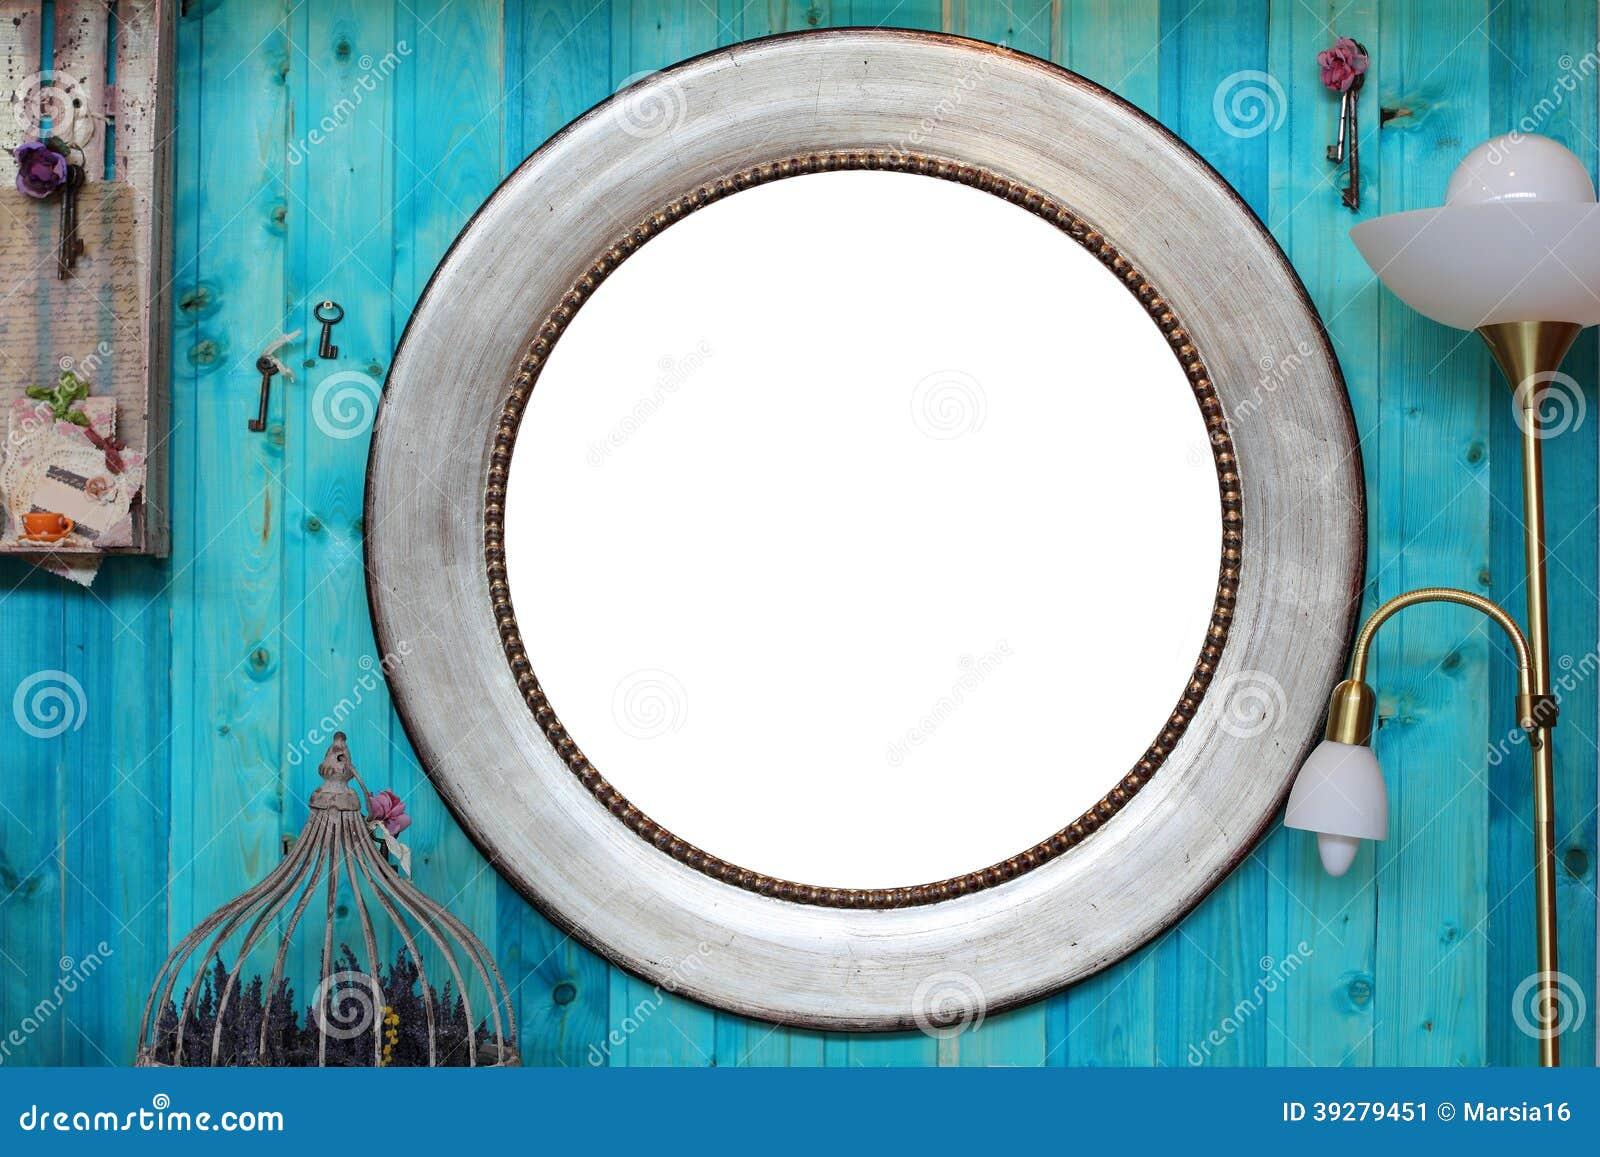 Round Frame in the Interior